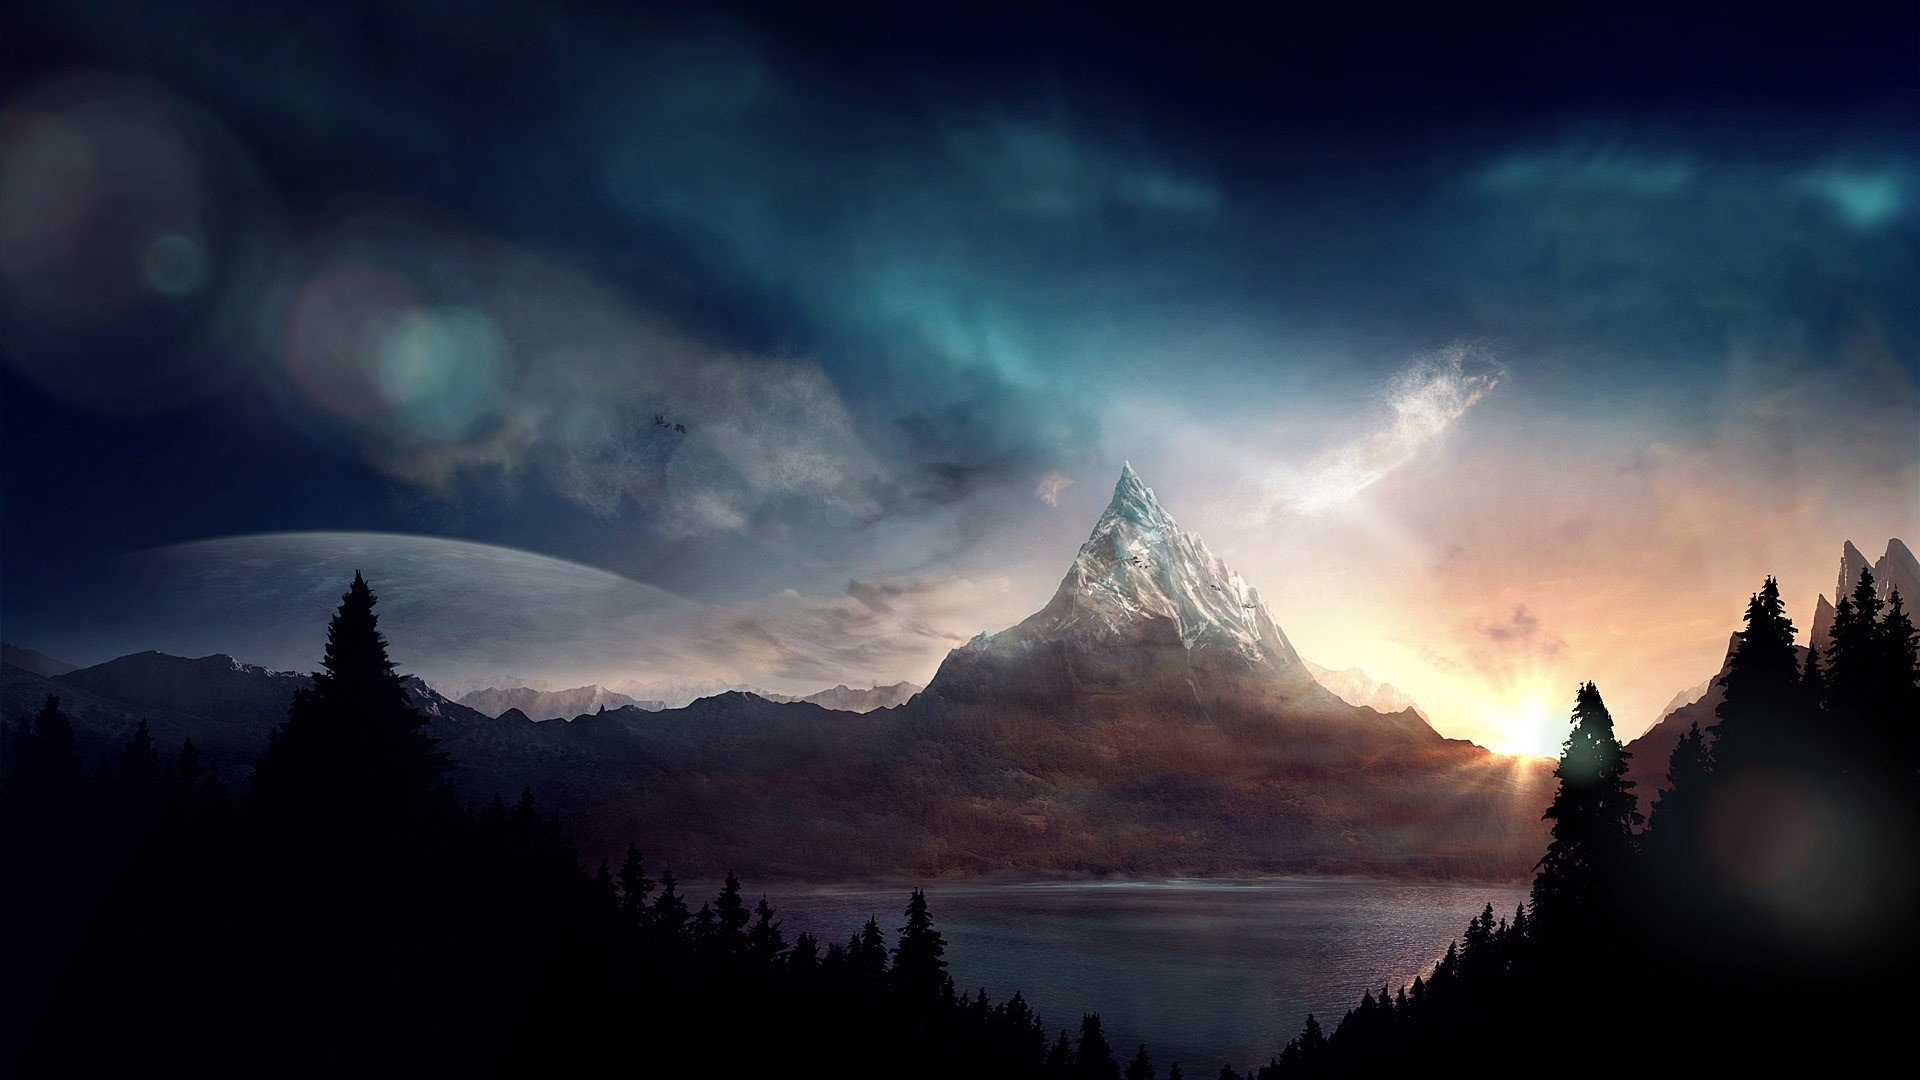 Mountain Peaks Fantasy Wallpaper